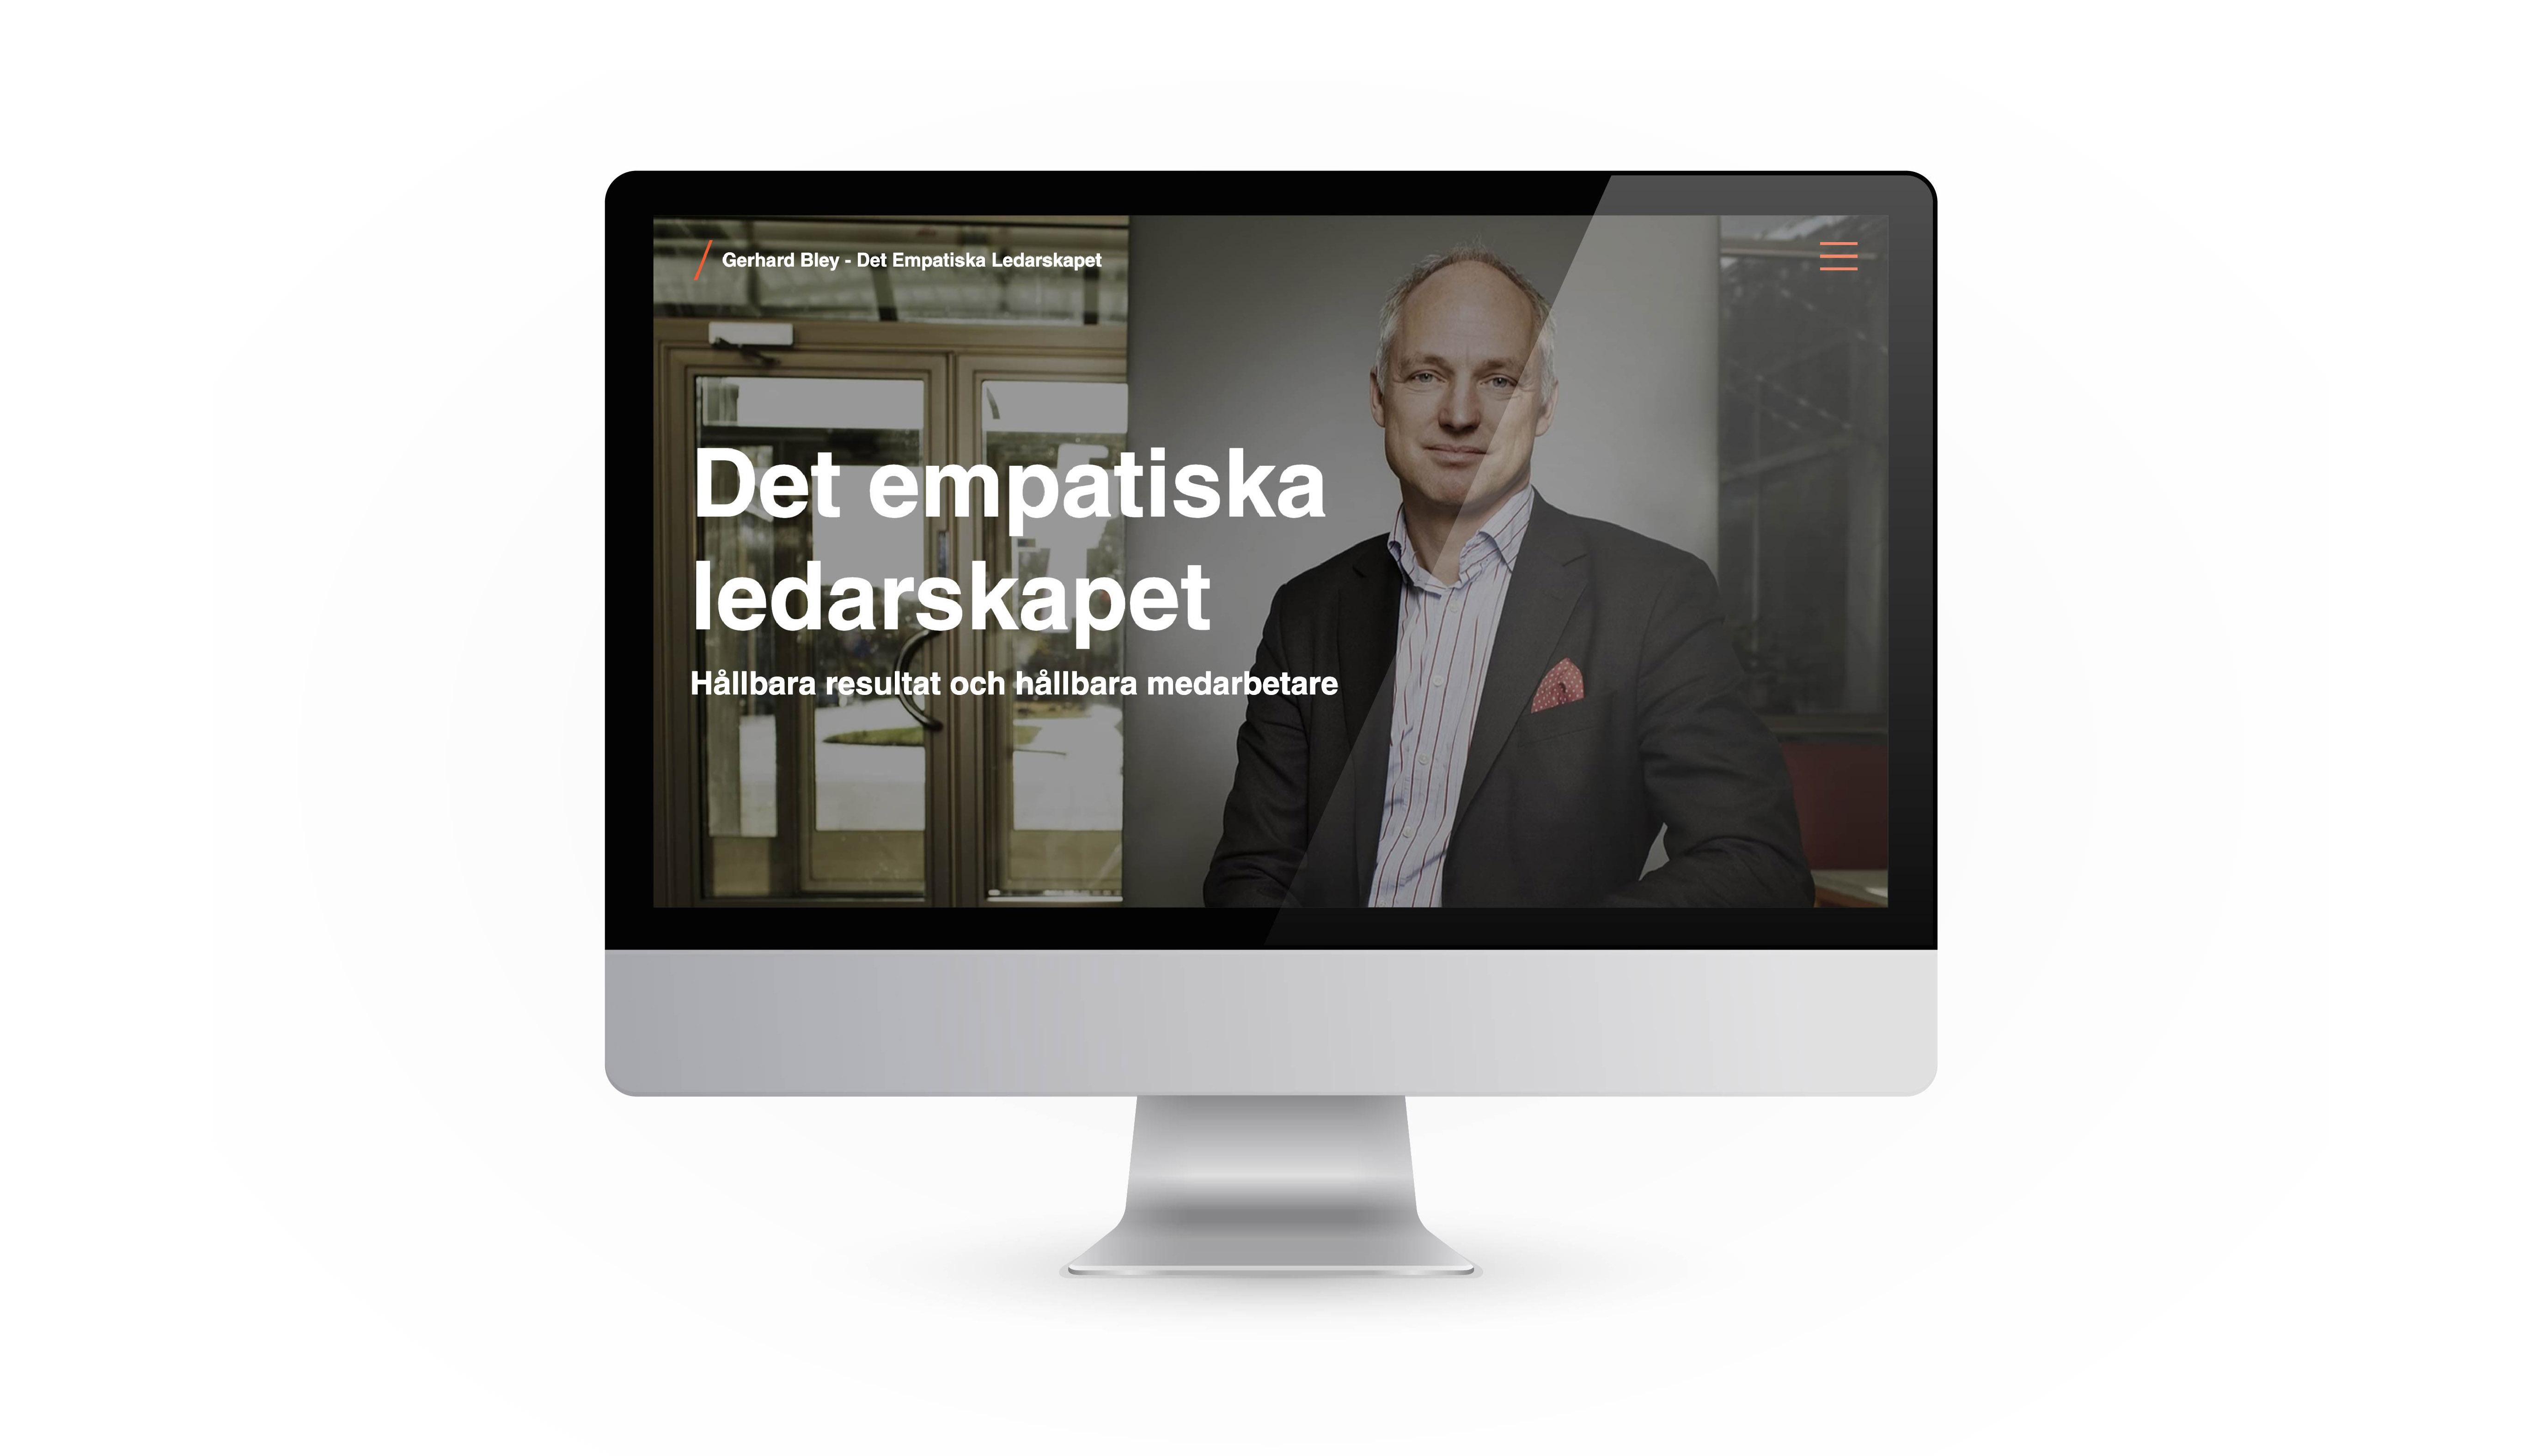 Det Empatiska Ledarskapet - Gerhard Bley Website design